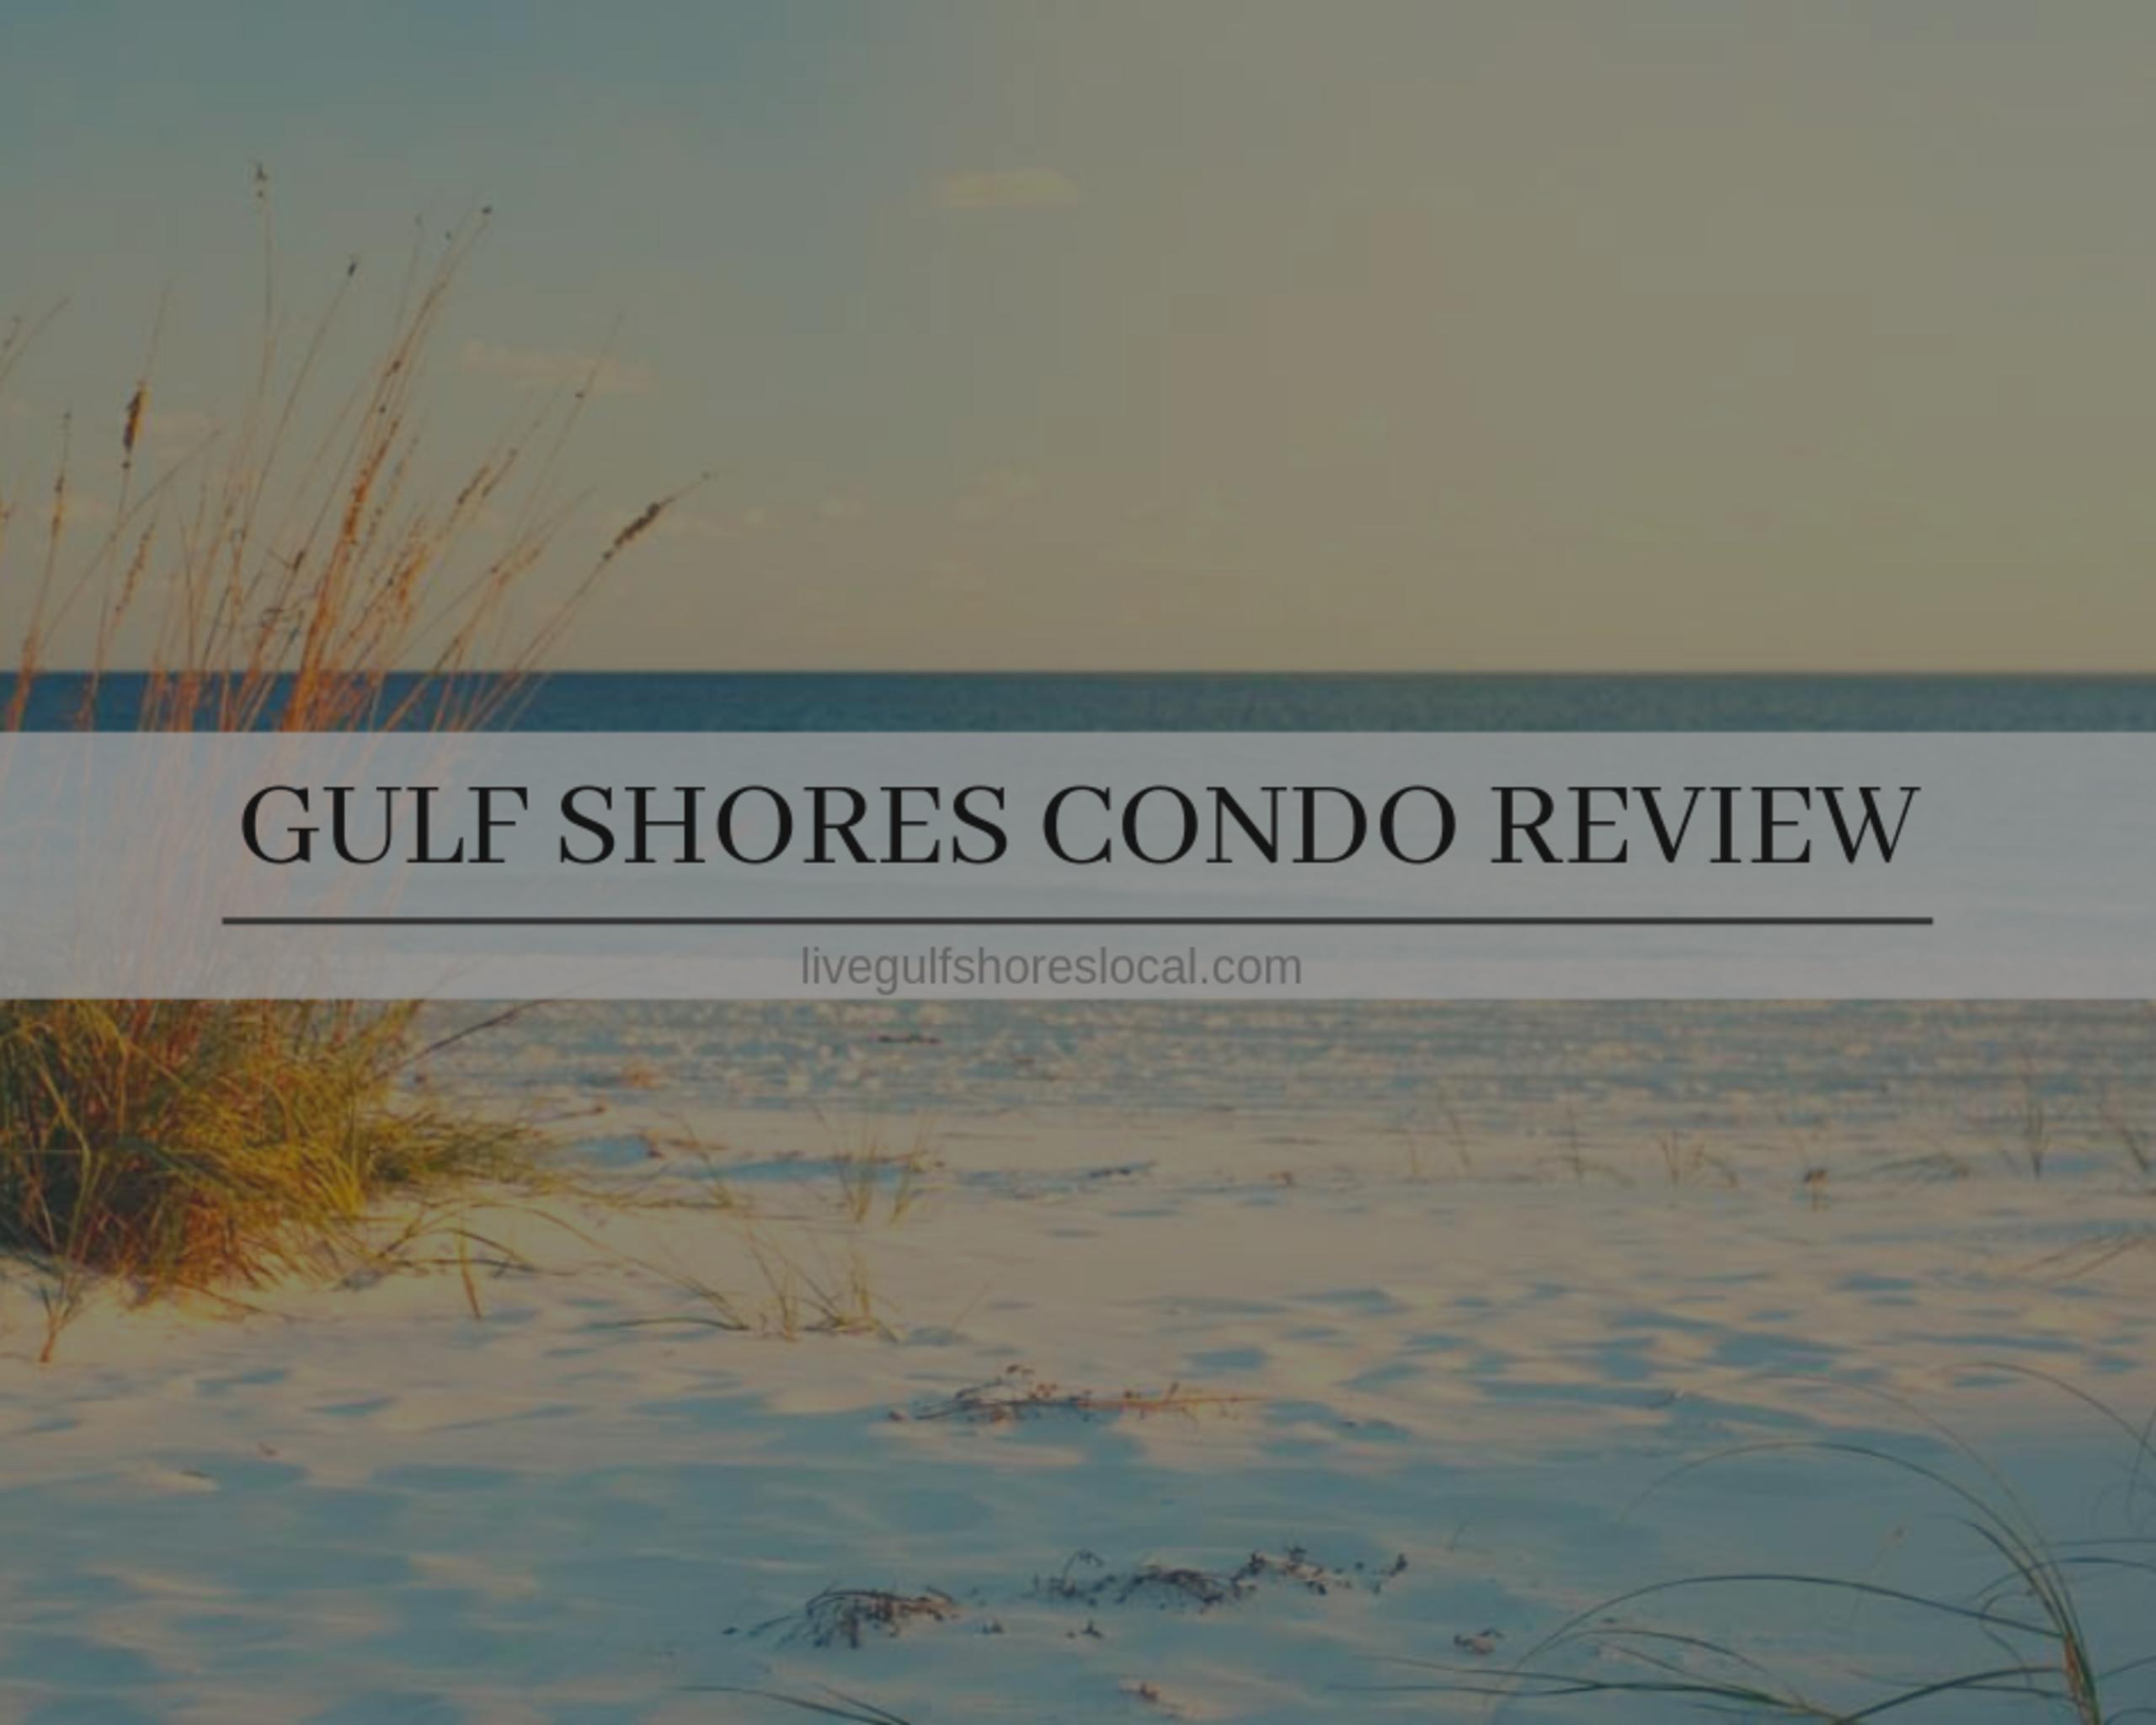 Gulf Shores Condo Review – June 2019